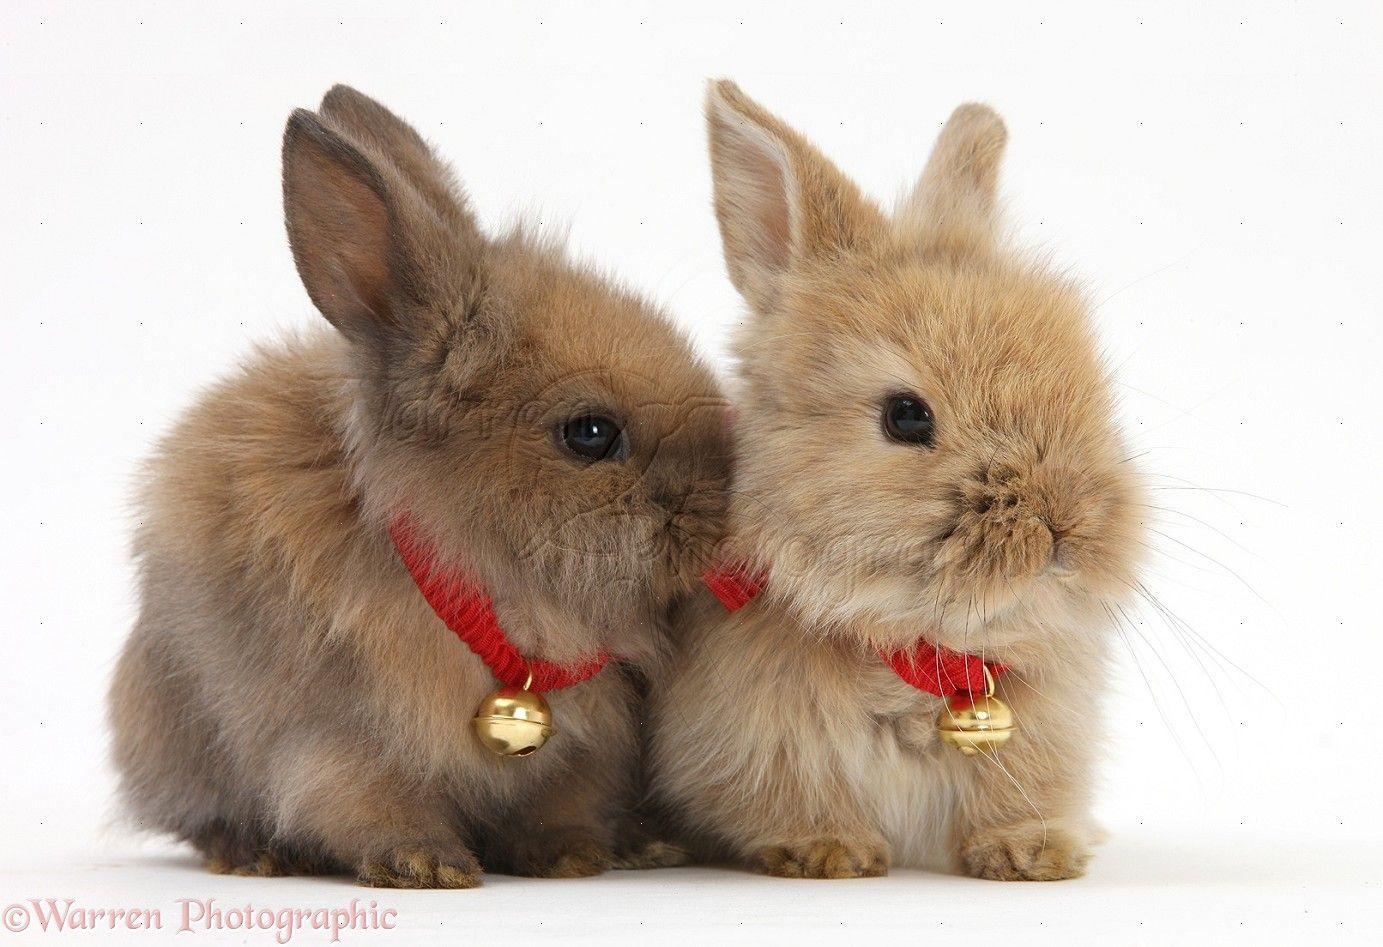 Bunnies with bells cute baby bunnies christmas animals